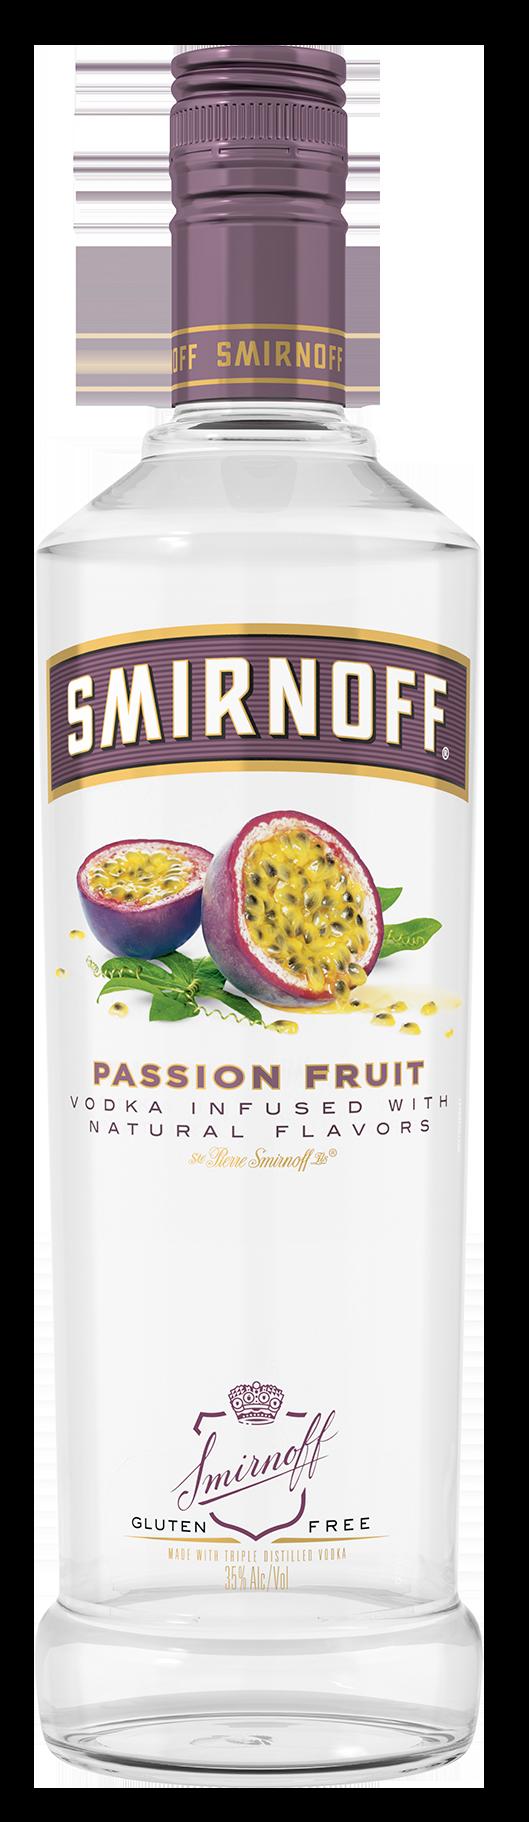 SMIRNOFF PASSION FRUIT